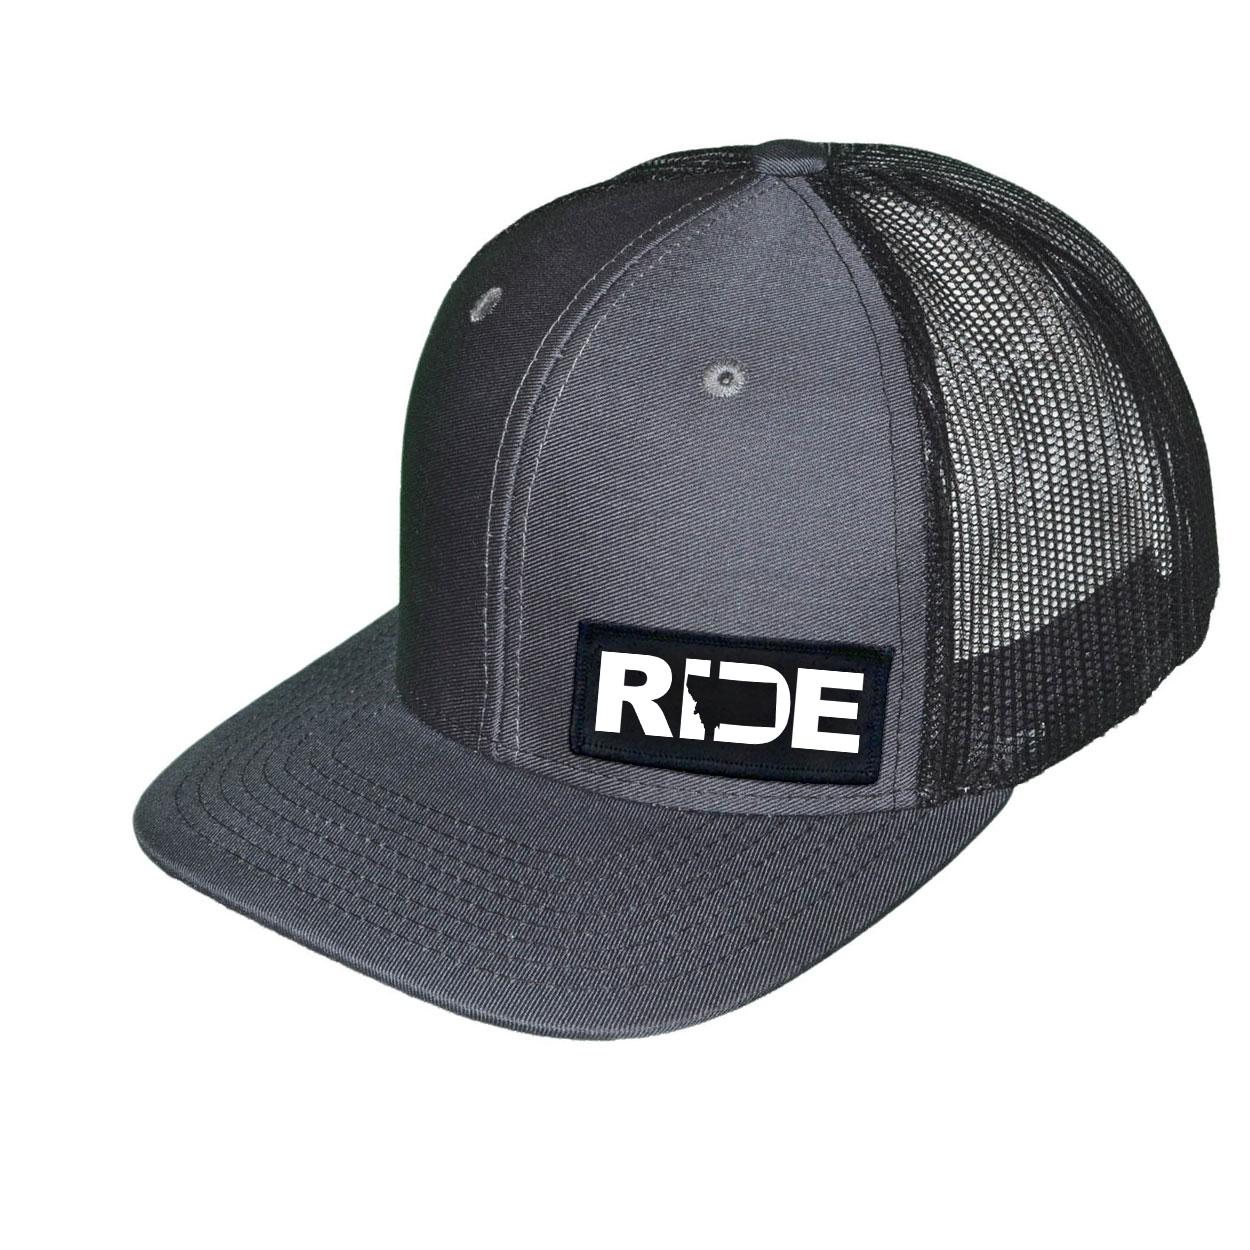 Ride Montana Night Out Woven Patch Snapback Trucker Hat Dark Gray/Black (White Logo)